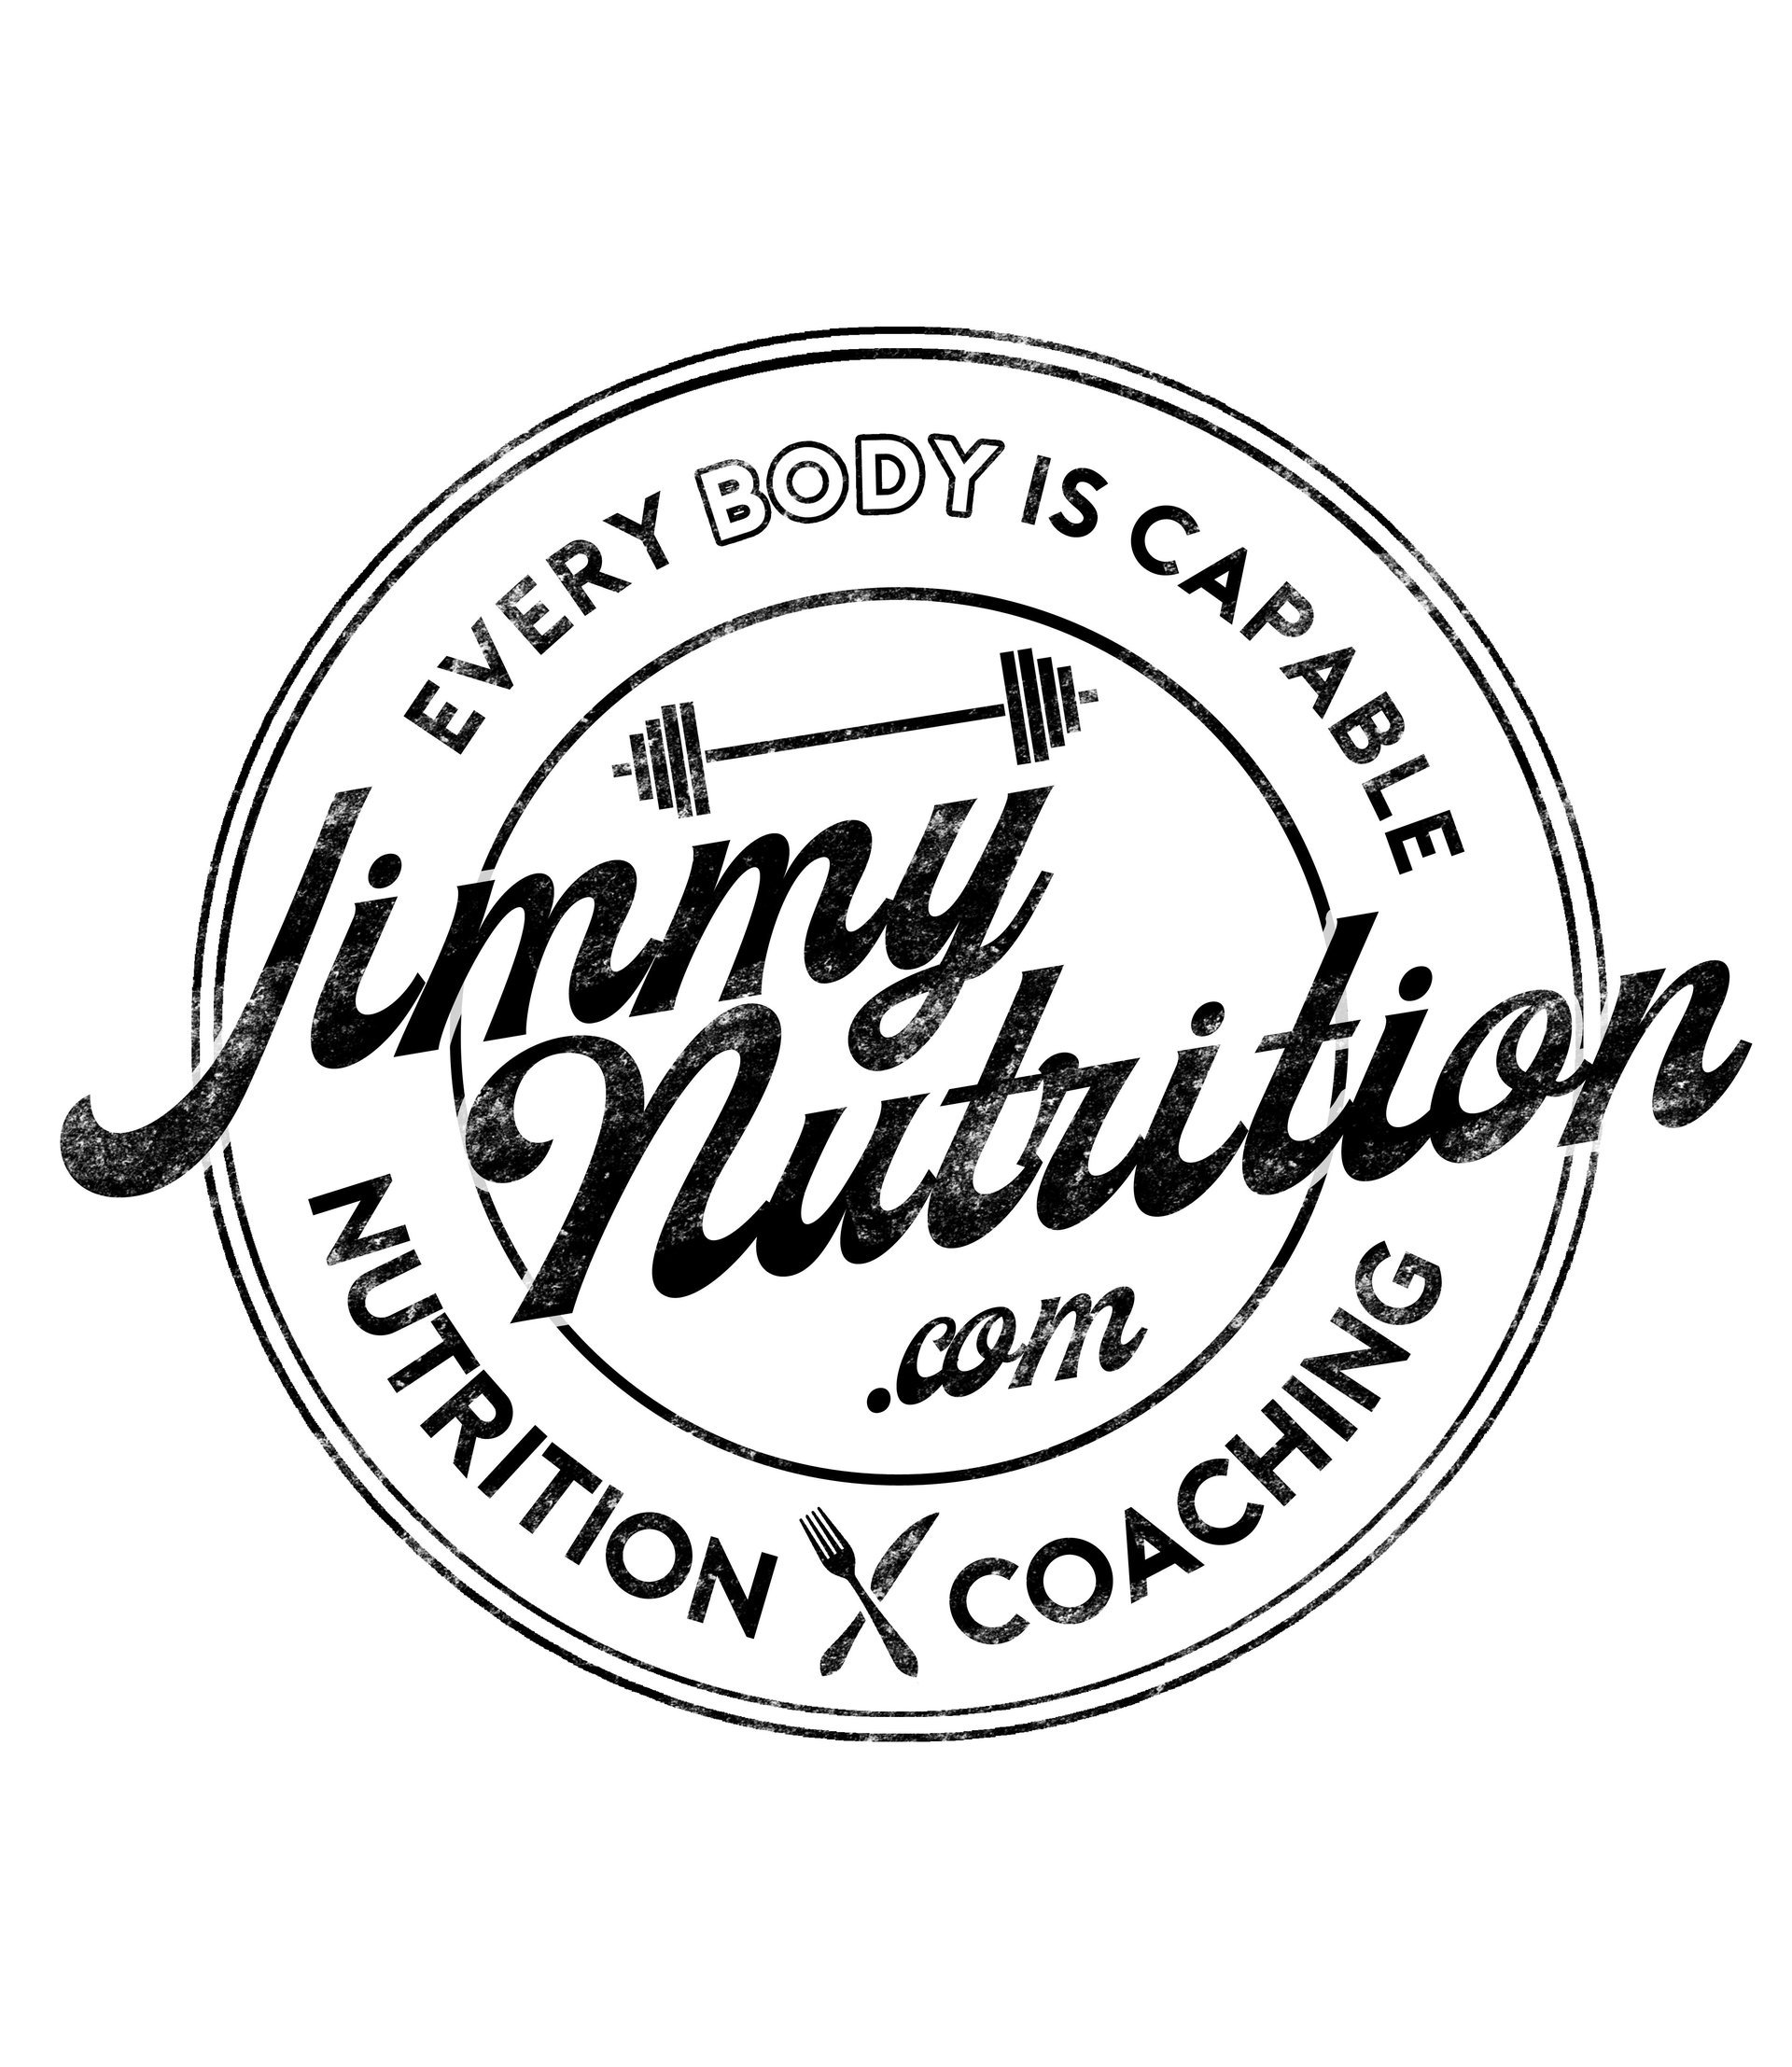 Jimmy Nutrition, Nutritional Coaching